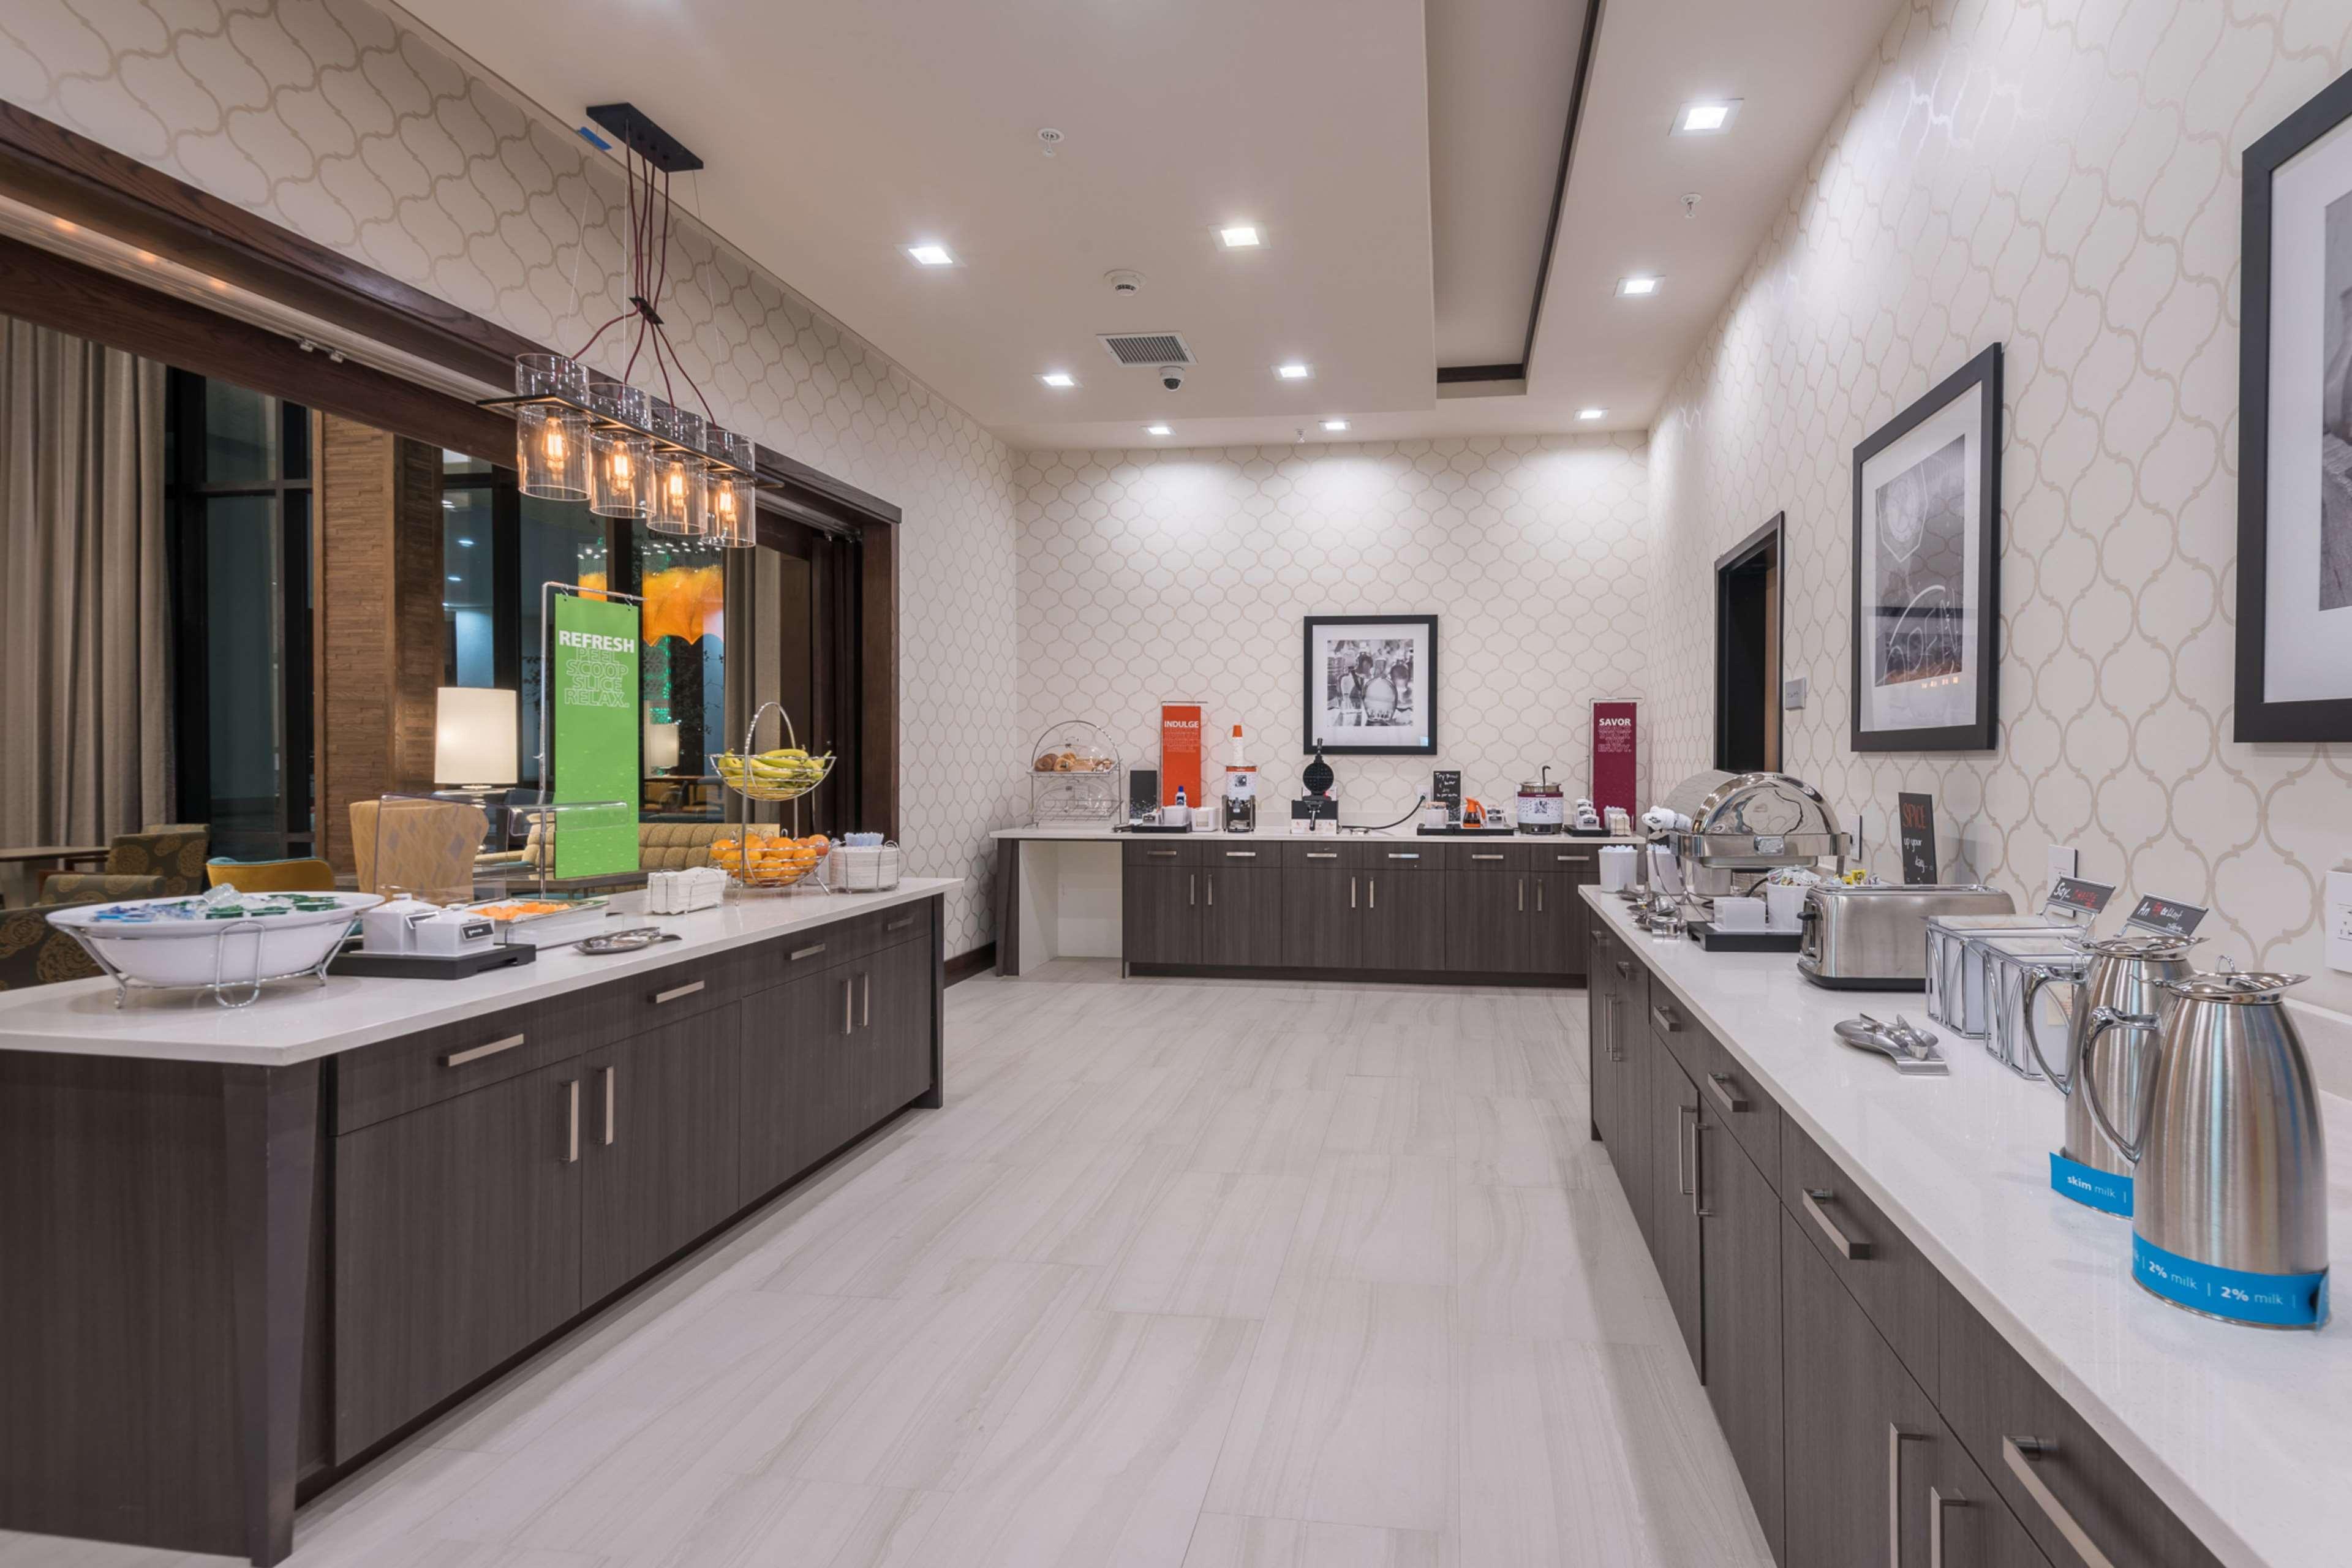 Hampton Inn & Suites Dallas-The Colony, TX image 12